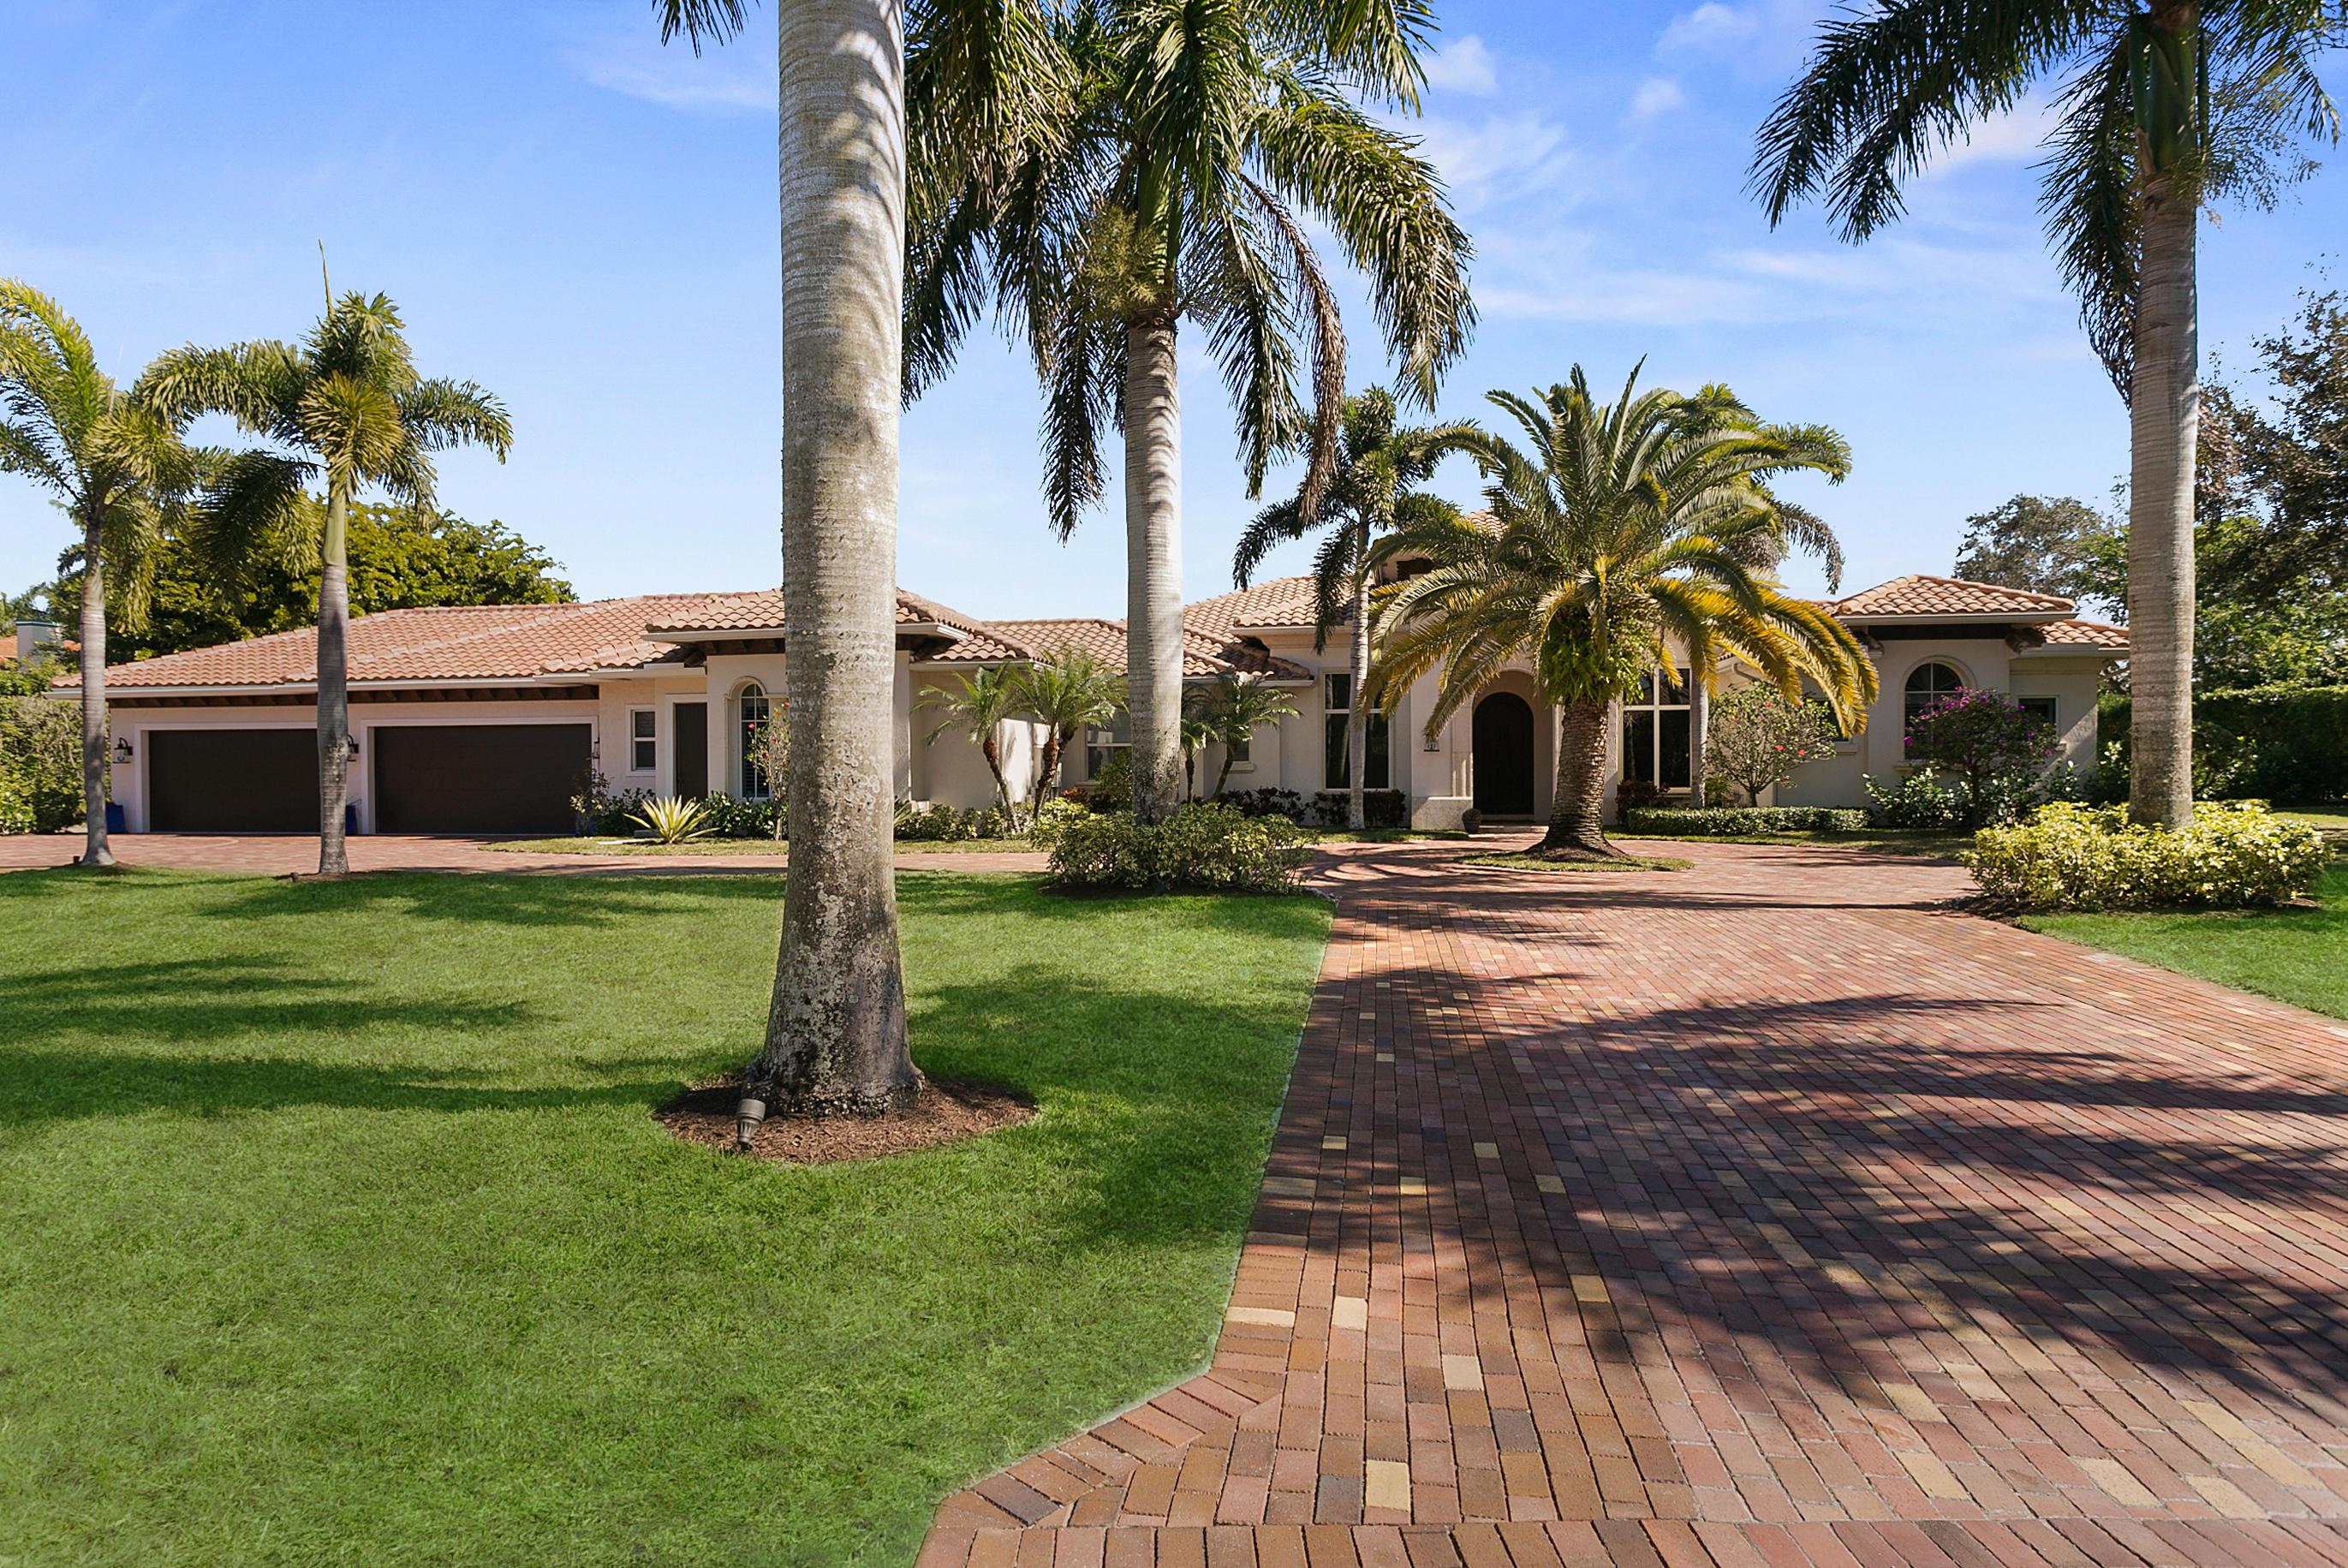 8635 Sawpine Road, Delray Beach, Florida 33446, 5 Bedrooms Bedrooms, ,5.2 BathroomsBathrooms,Single Family Detached,For Sale,Sawpine,RX-10713590